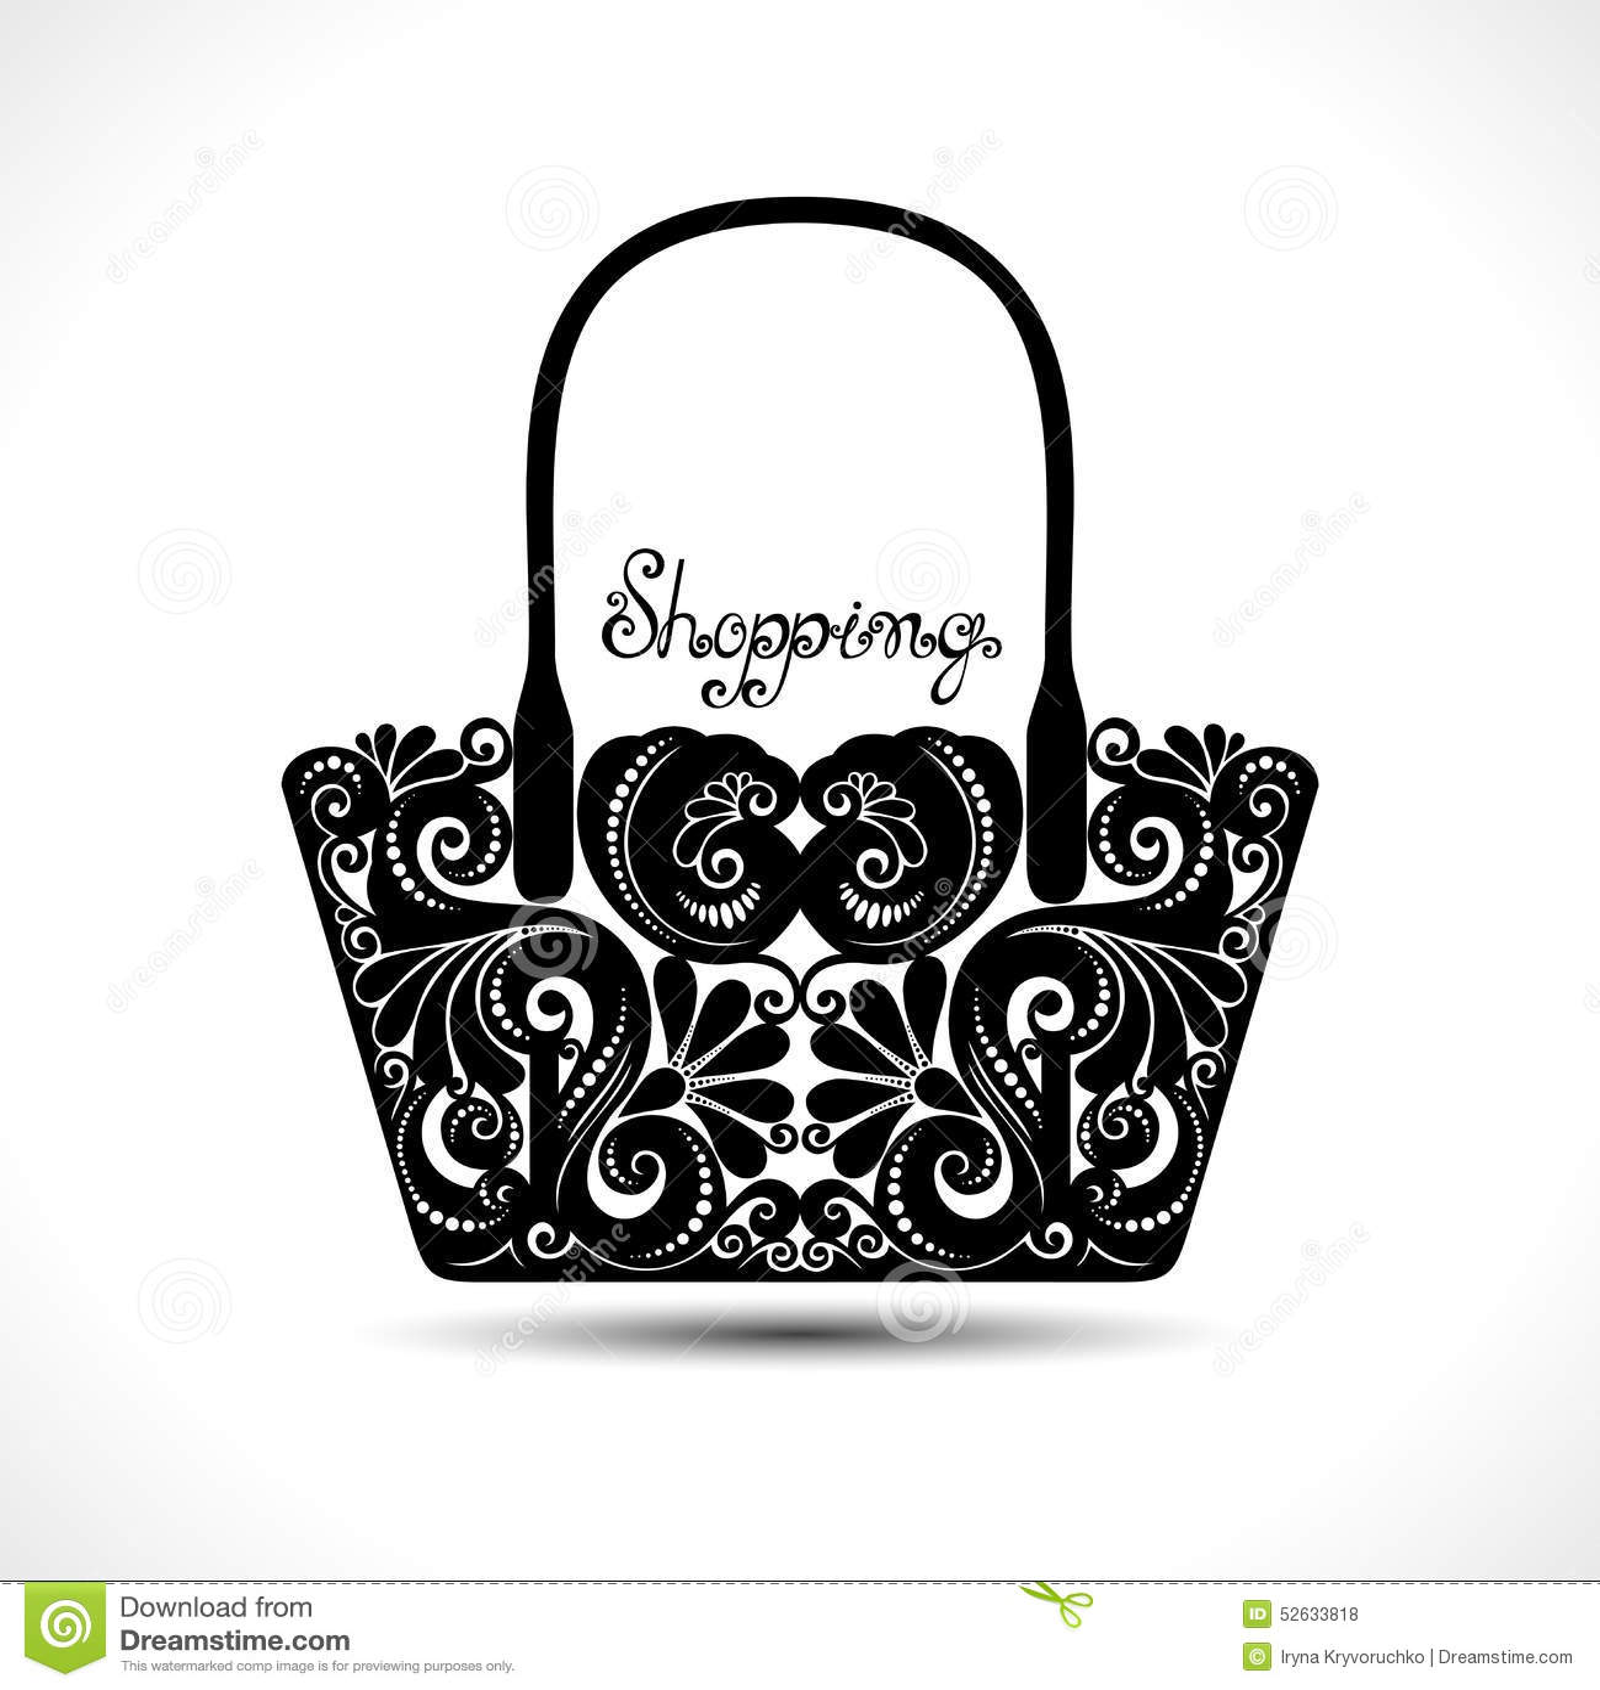 Vector Decorative Ornate Women\'s Bag Stock Vector - Illustration of ...